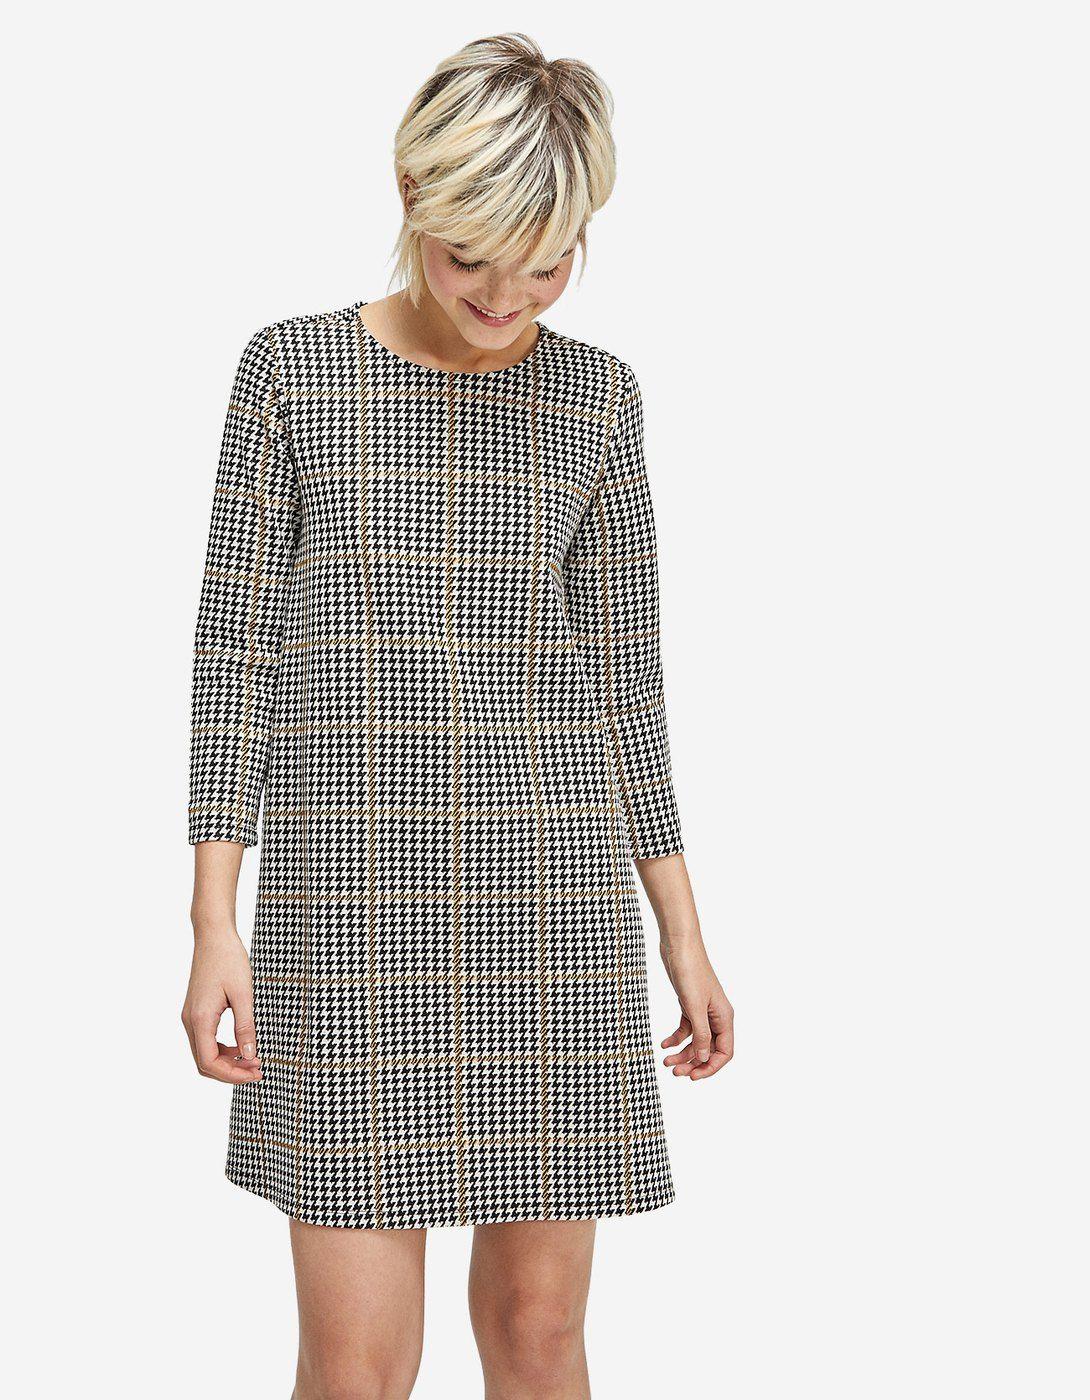 a-line dress - just in | stradivarius méxico | bekleidung